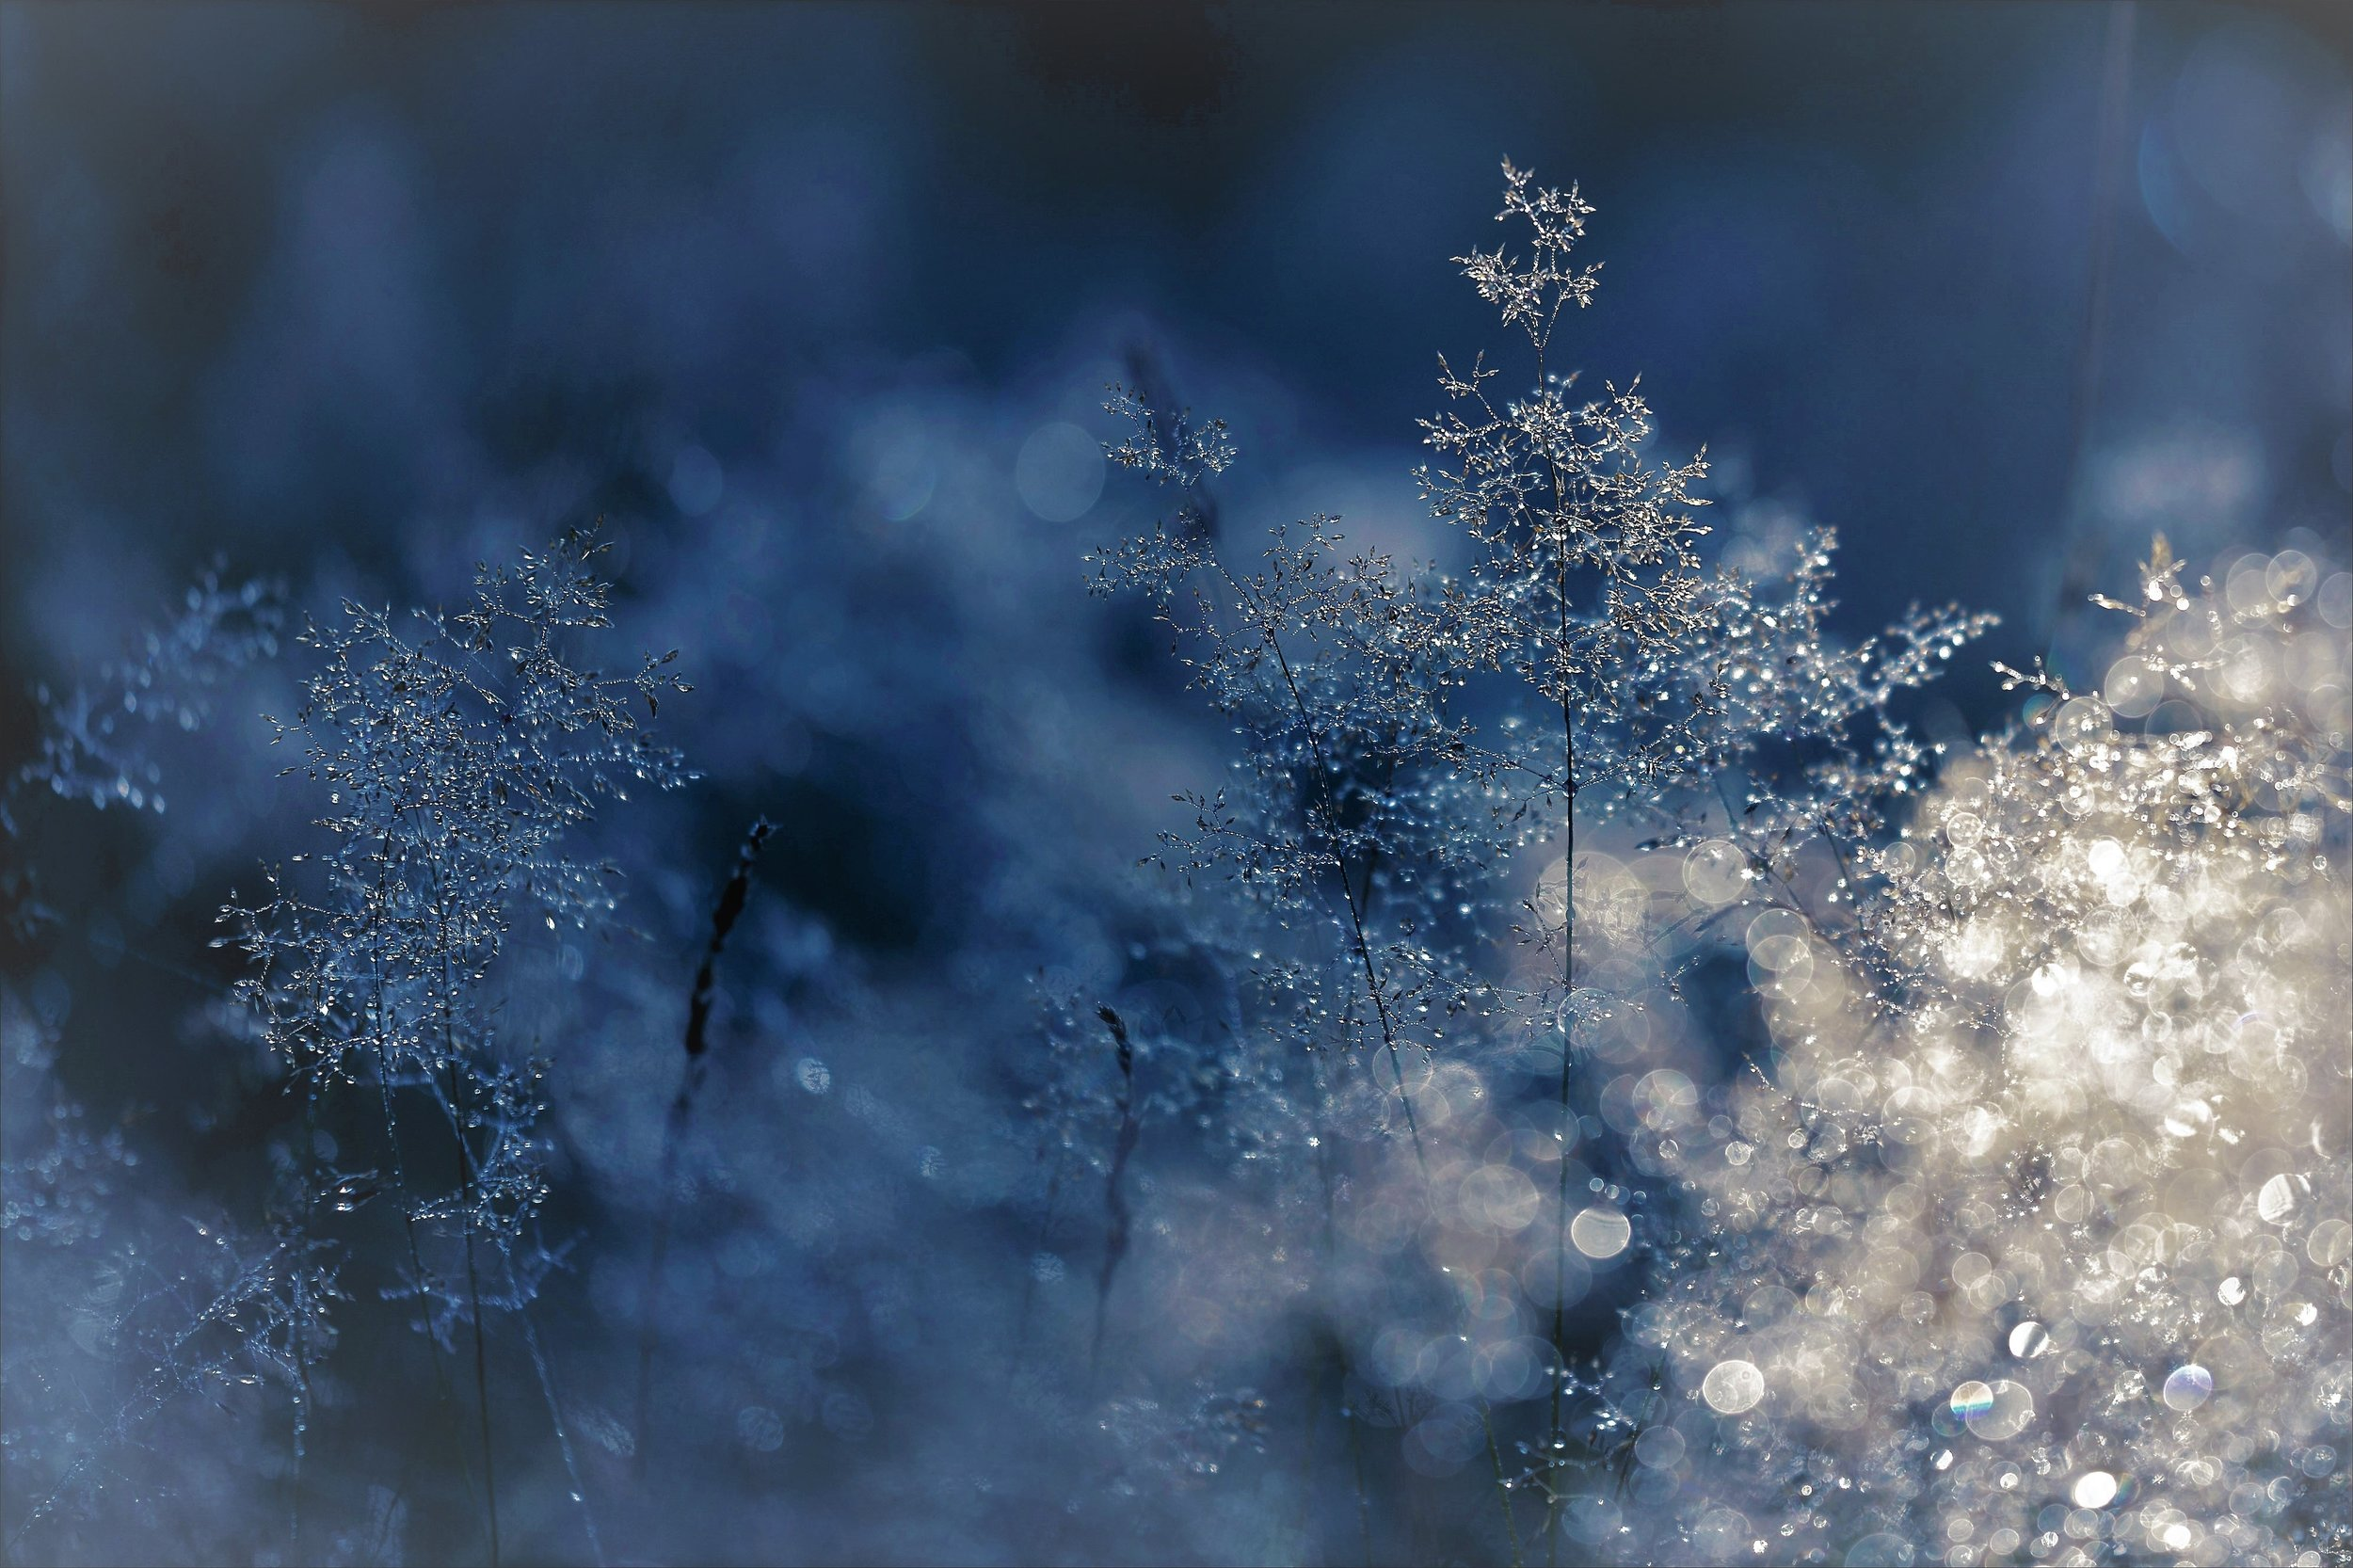 abstract-blur-branch-259698.jpg